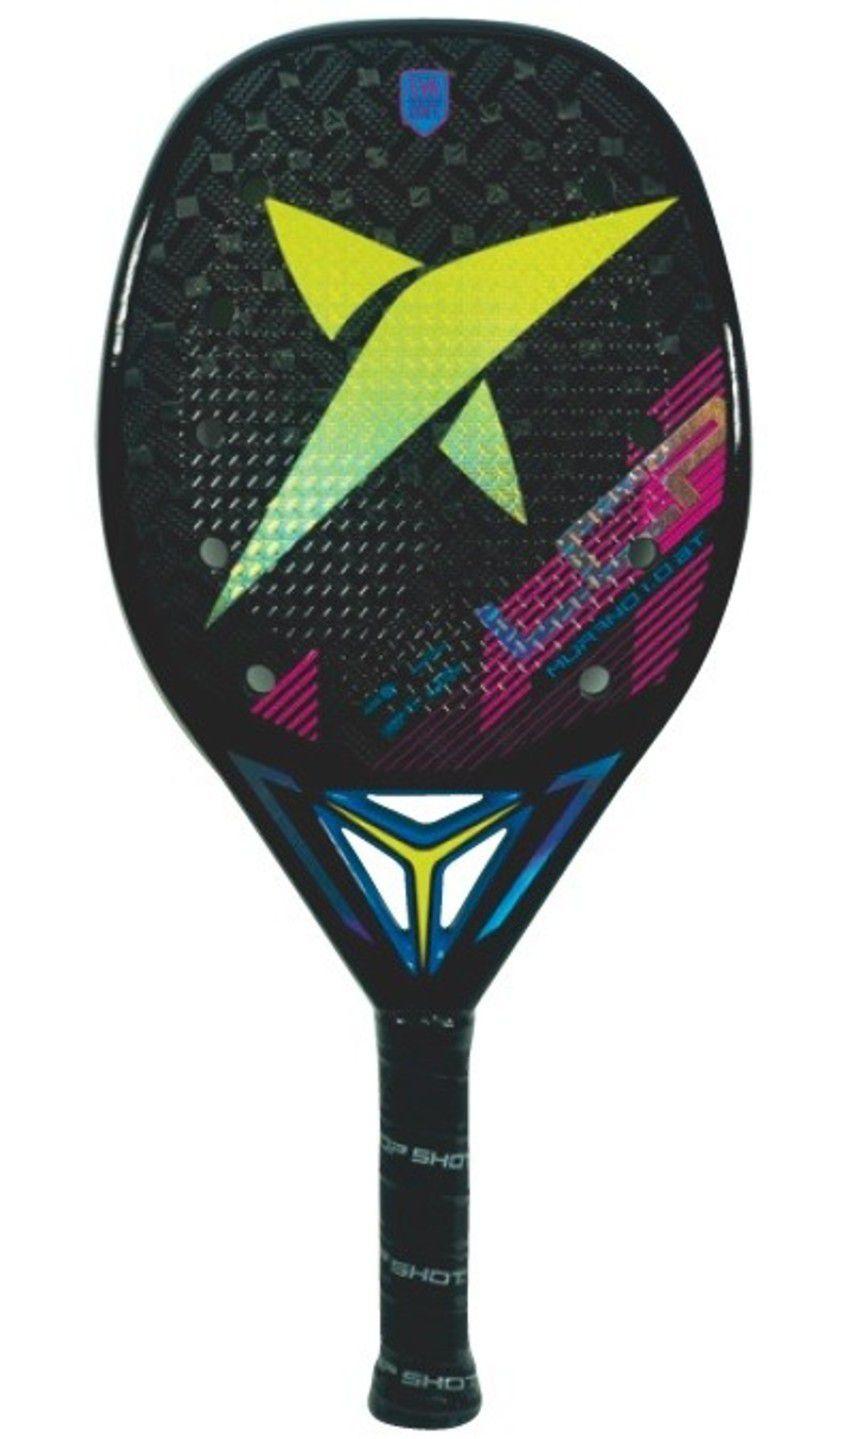 Raquete Beach Tennis DROP SHOT MURANO 1.0 - 2020